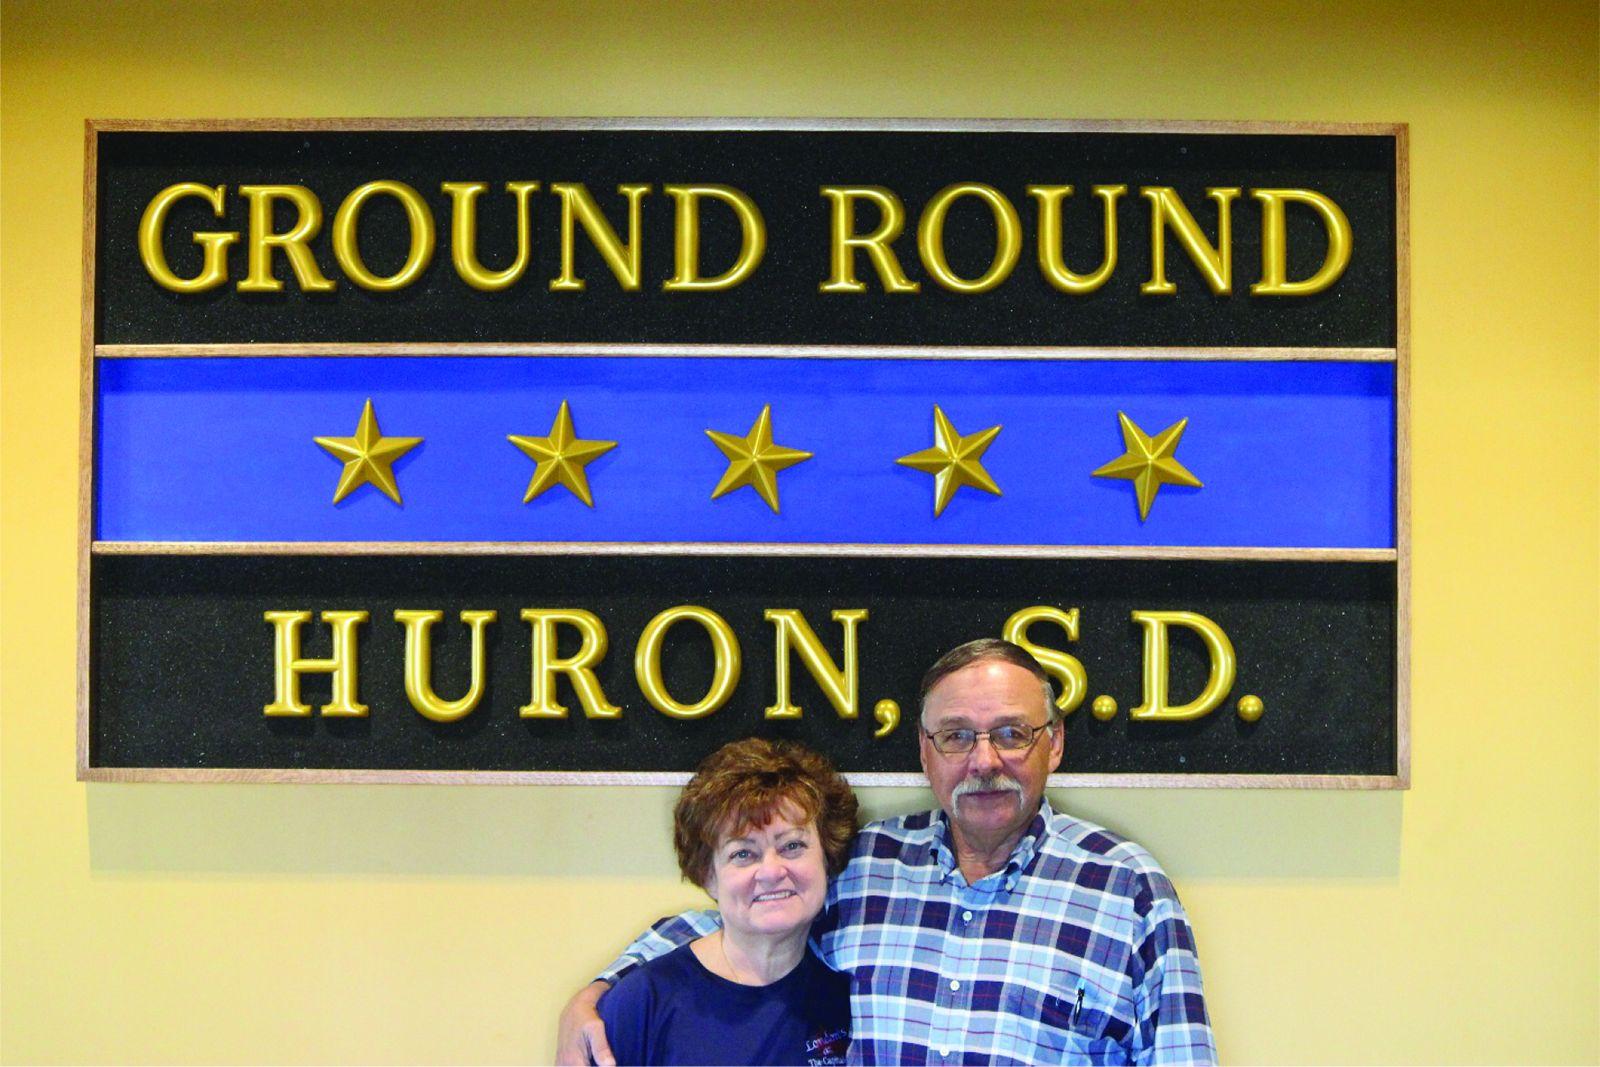 Ground Round Grill & Bar Opens Its Newest Restaurant in Huron, South Dakota